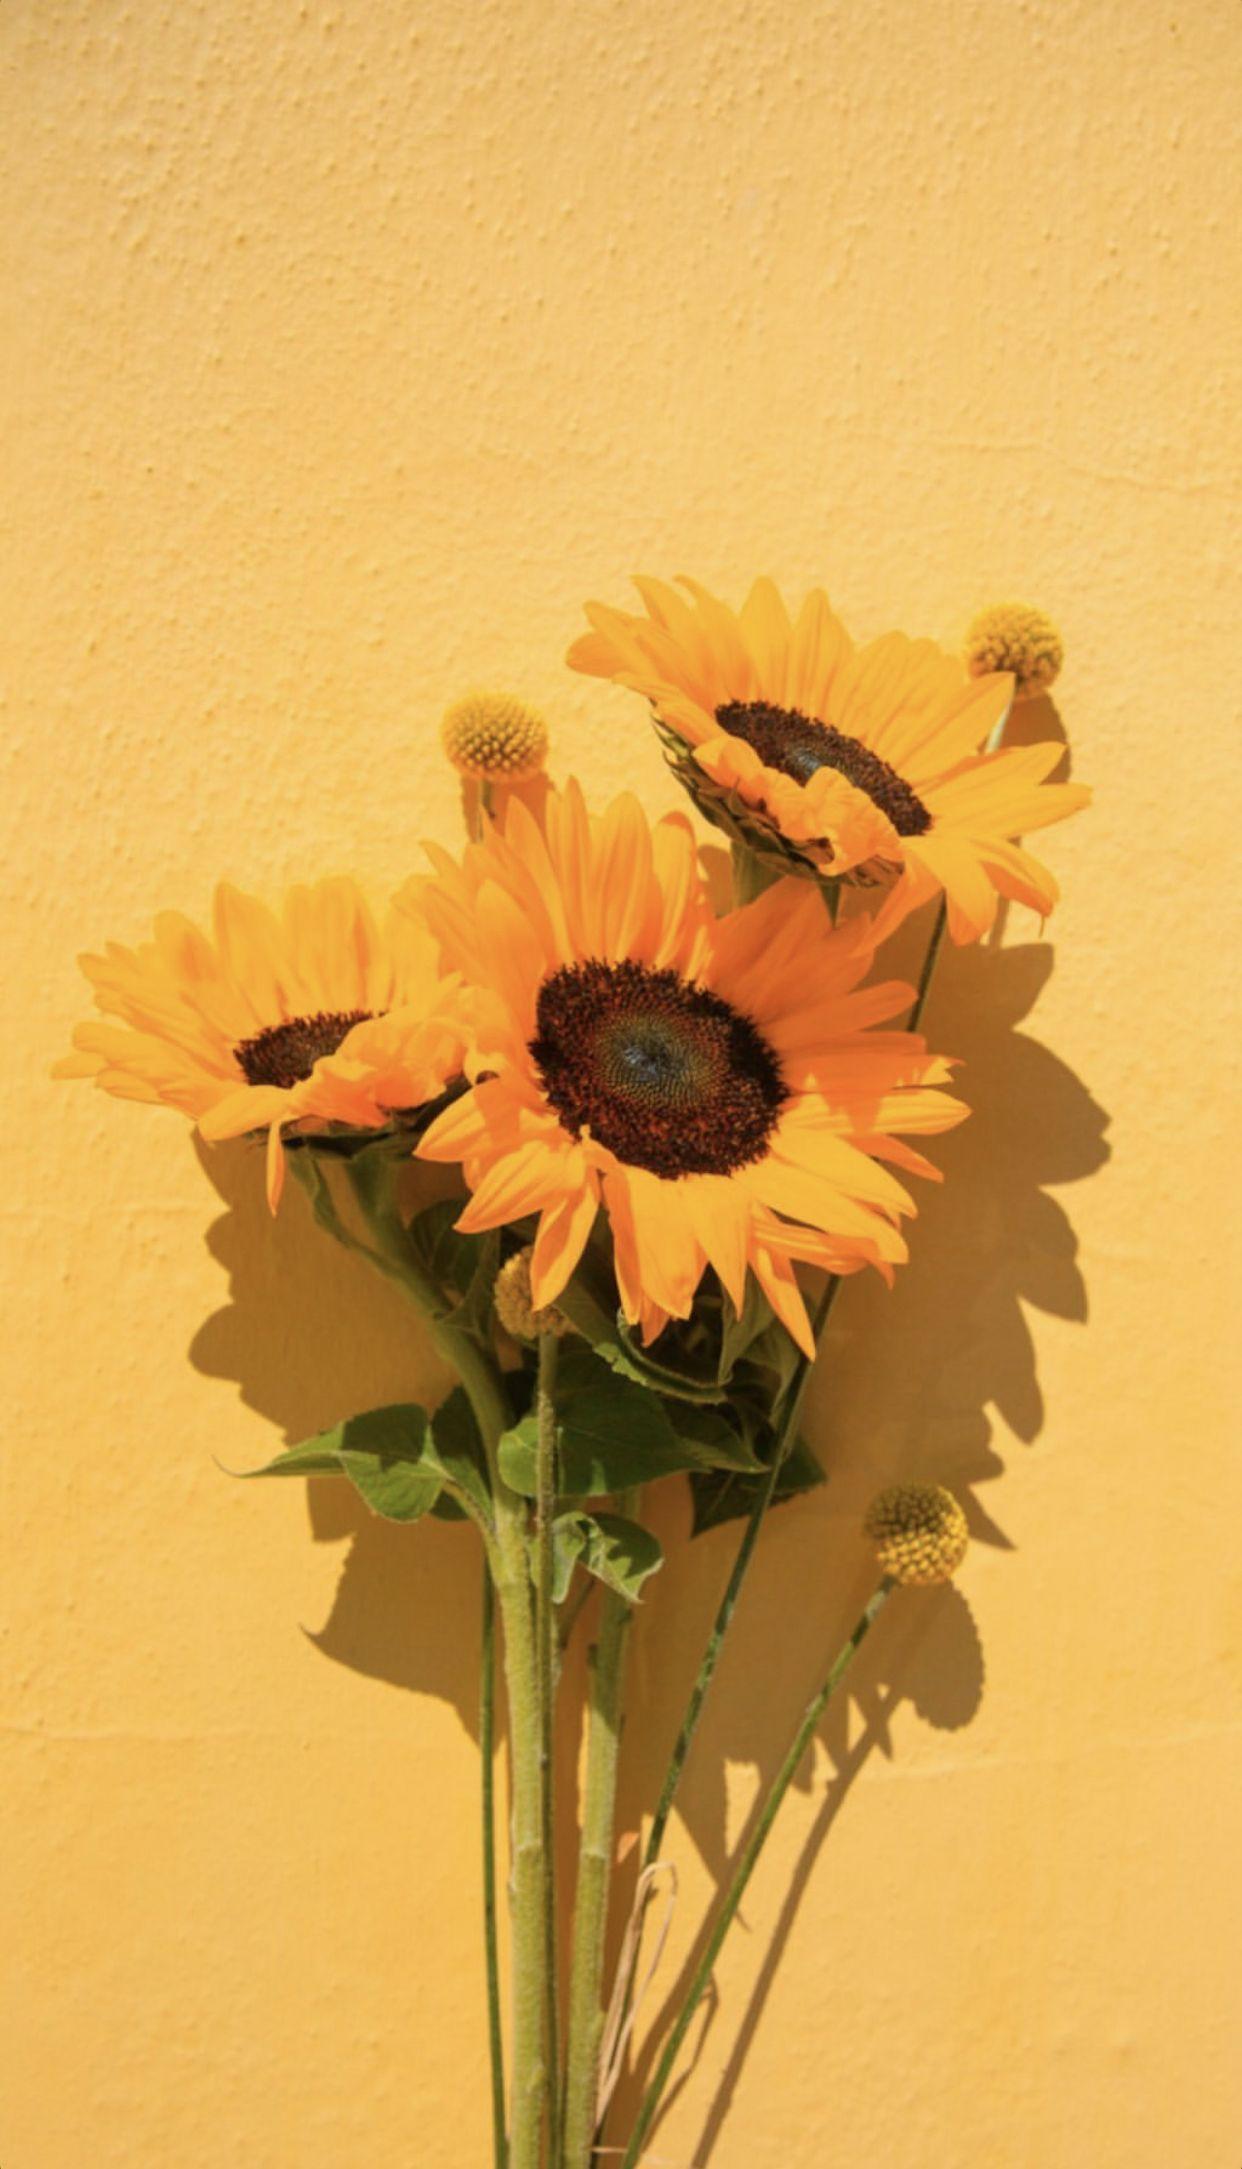 Yellow Summer Sunflowerwallpaper In 2020 Sunflower Wallpaper Flower Phone Wallpaper Sunflower Pictures